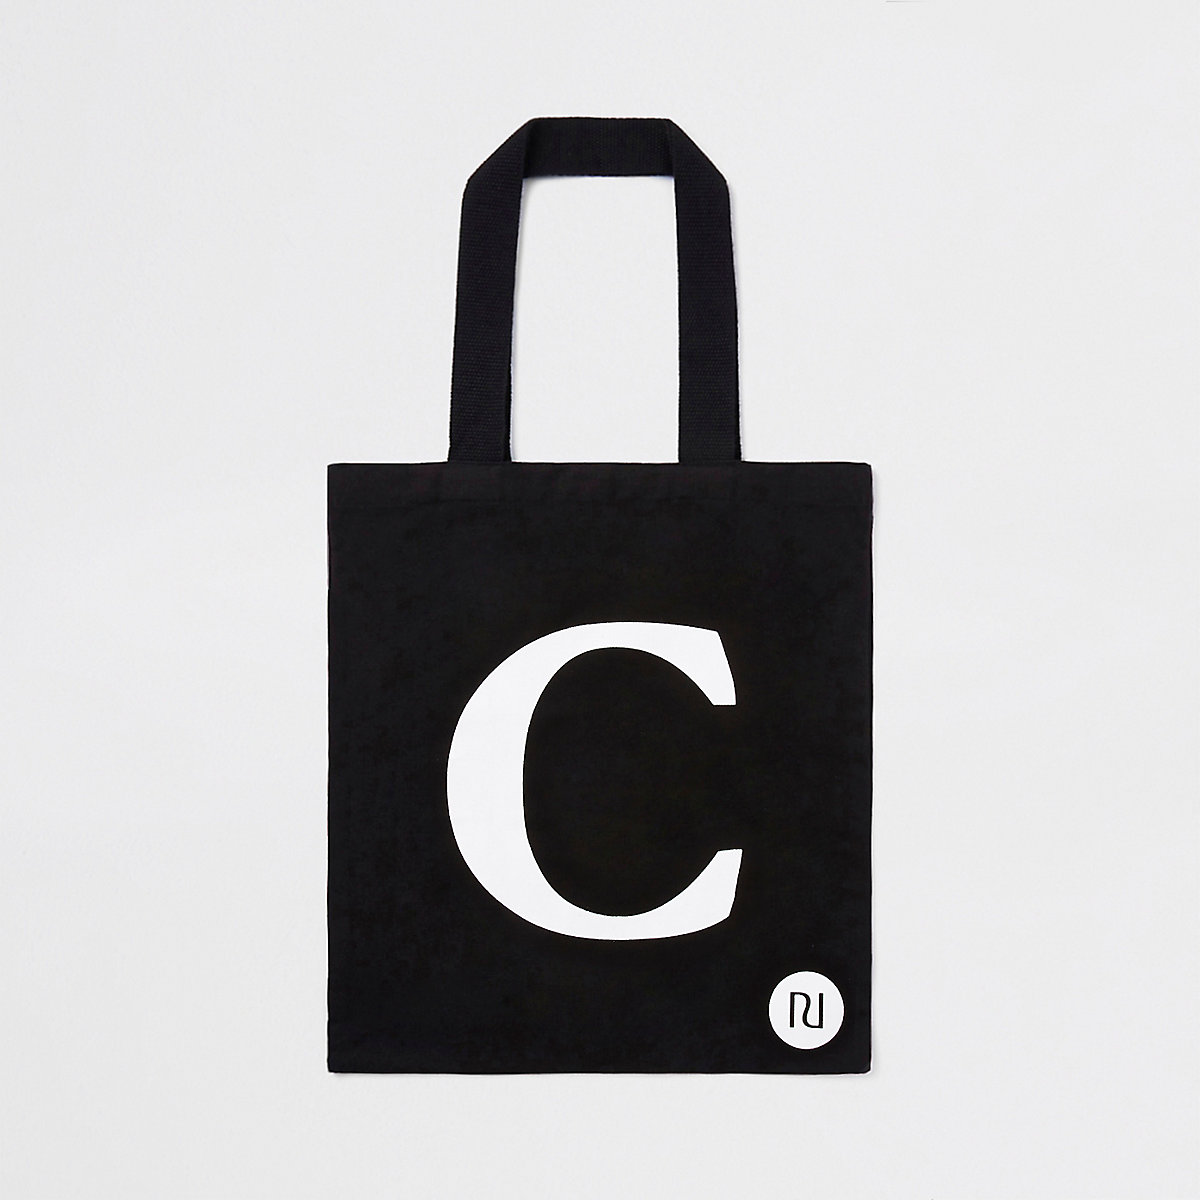 Black 'C' initial shopper tote bag